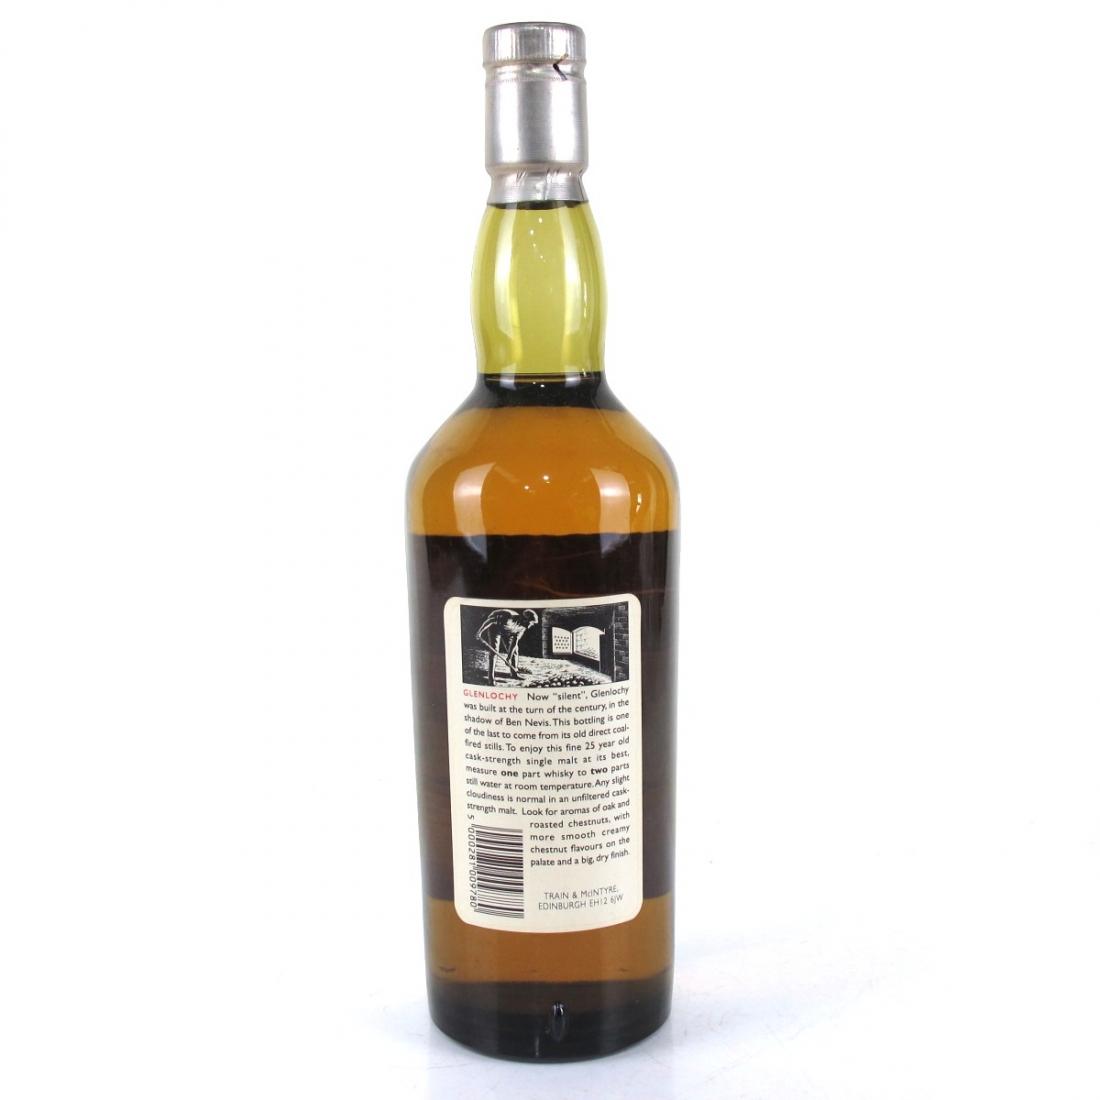 Glenlochy 1969 Rare Malt 25 Year Old 75cl / 62.2%